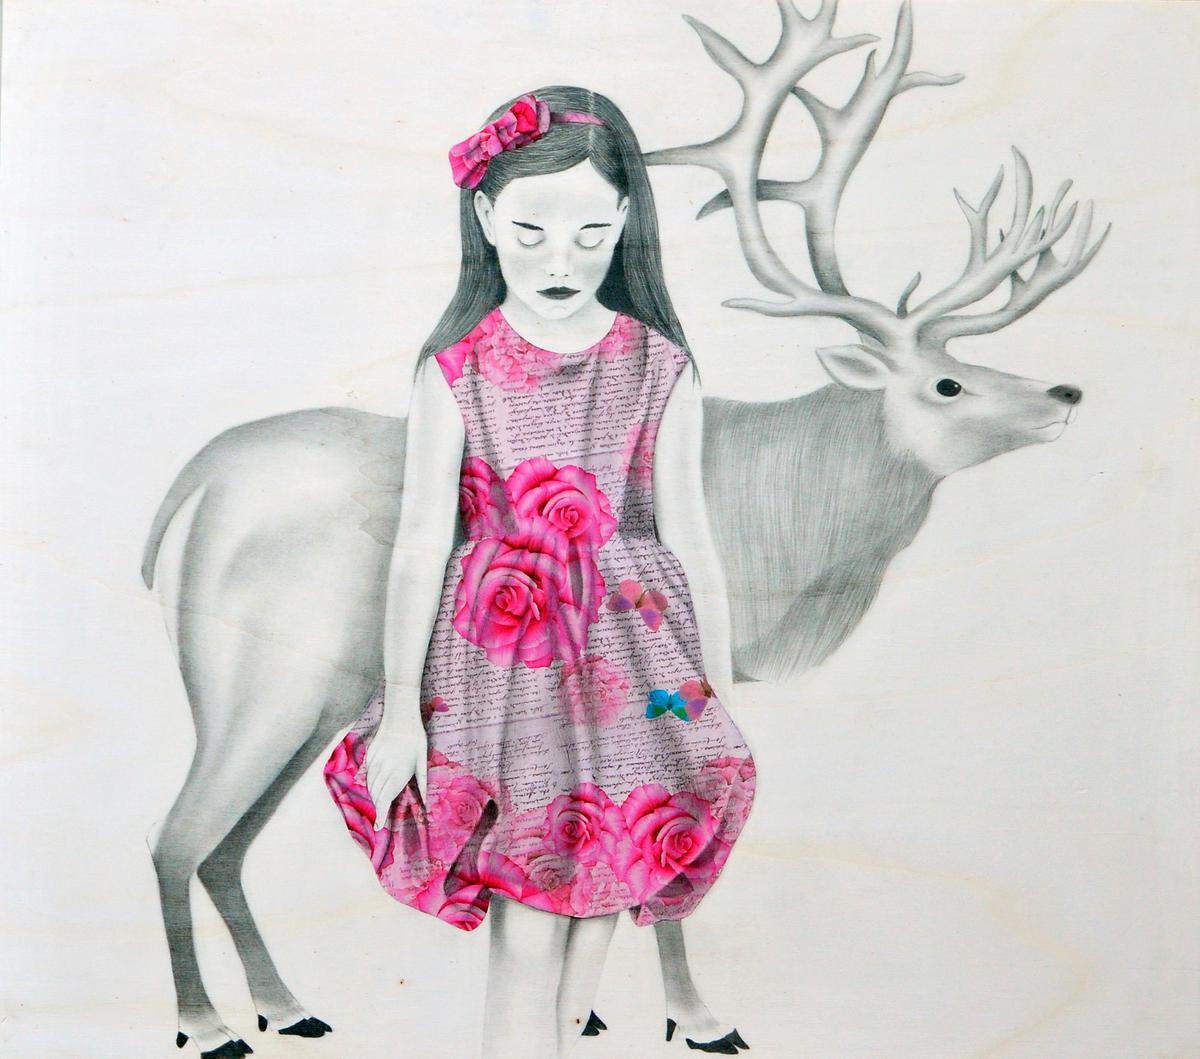 Marzia Roversi Olga E La Renna Art For Sale On Kooness